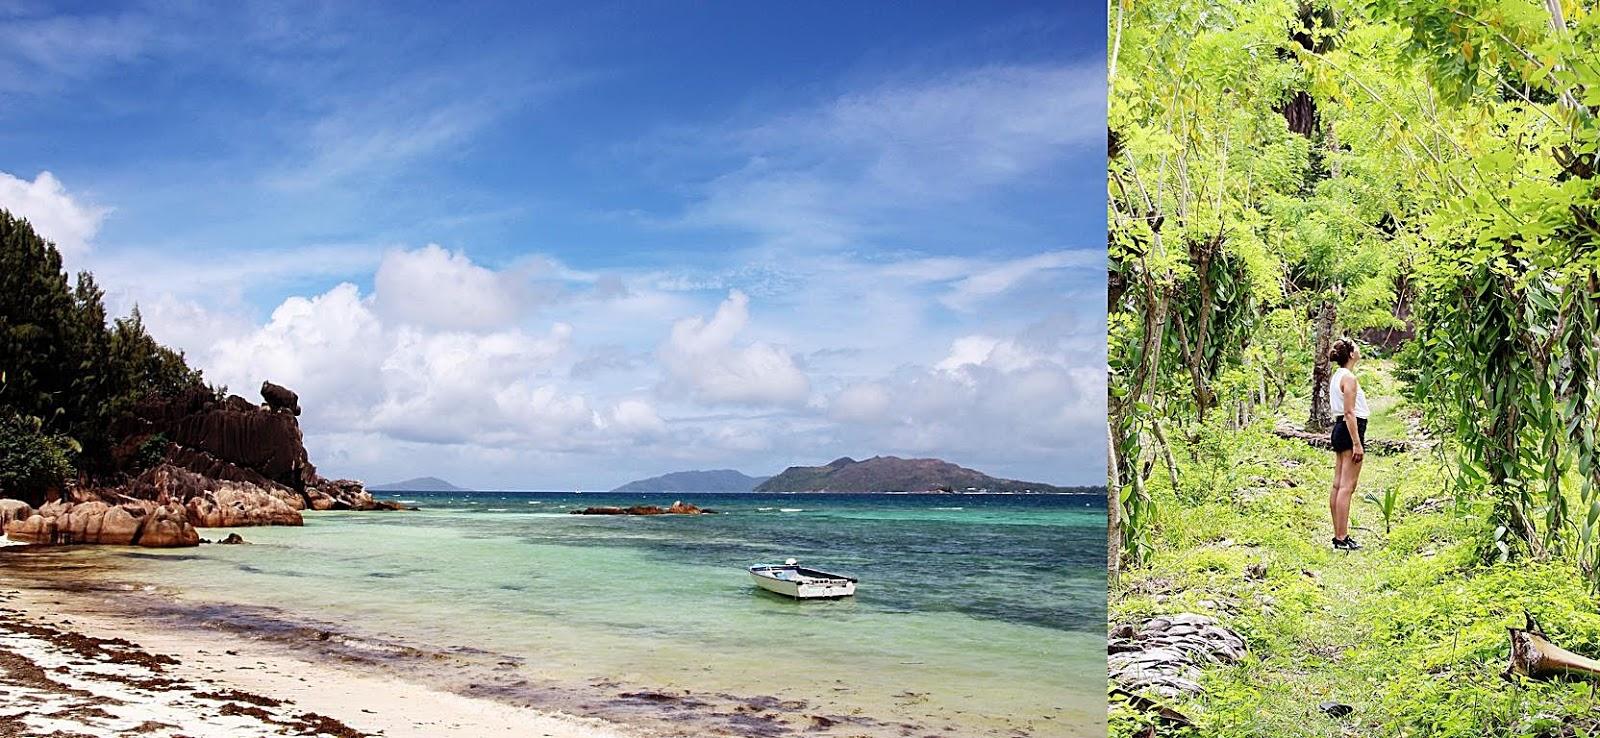 Insel Curieuse und Vanilleplantage auf La Digue